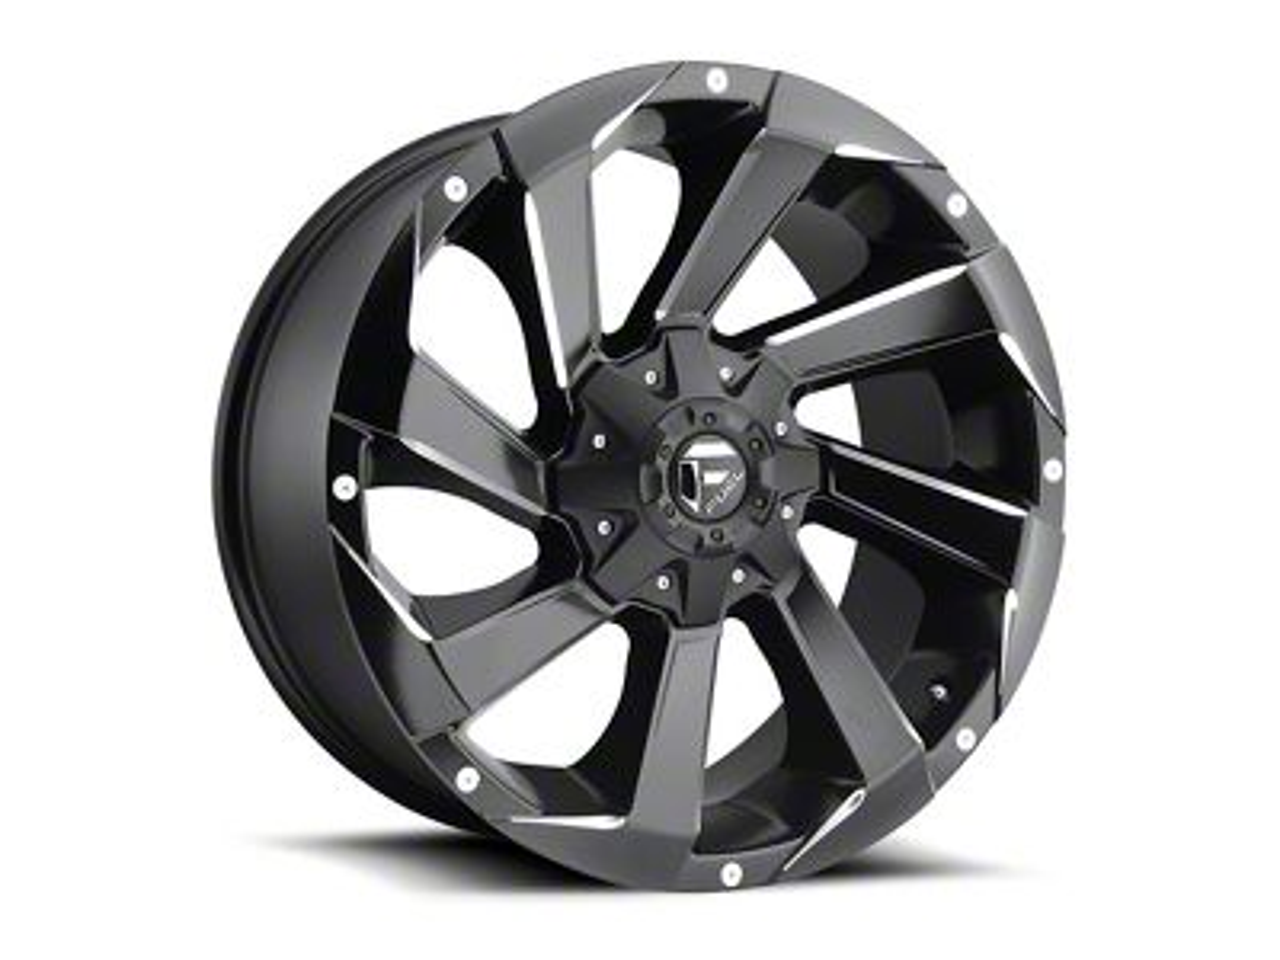 Fuel Wheels Razor Matte Black Milled 5-Lug Wheel - 20x9 (02-18 RAM 1500, Excluding Mega Cab)